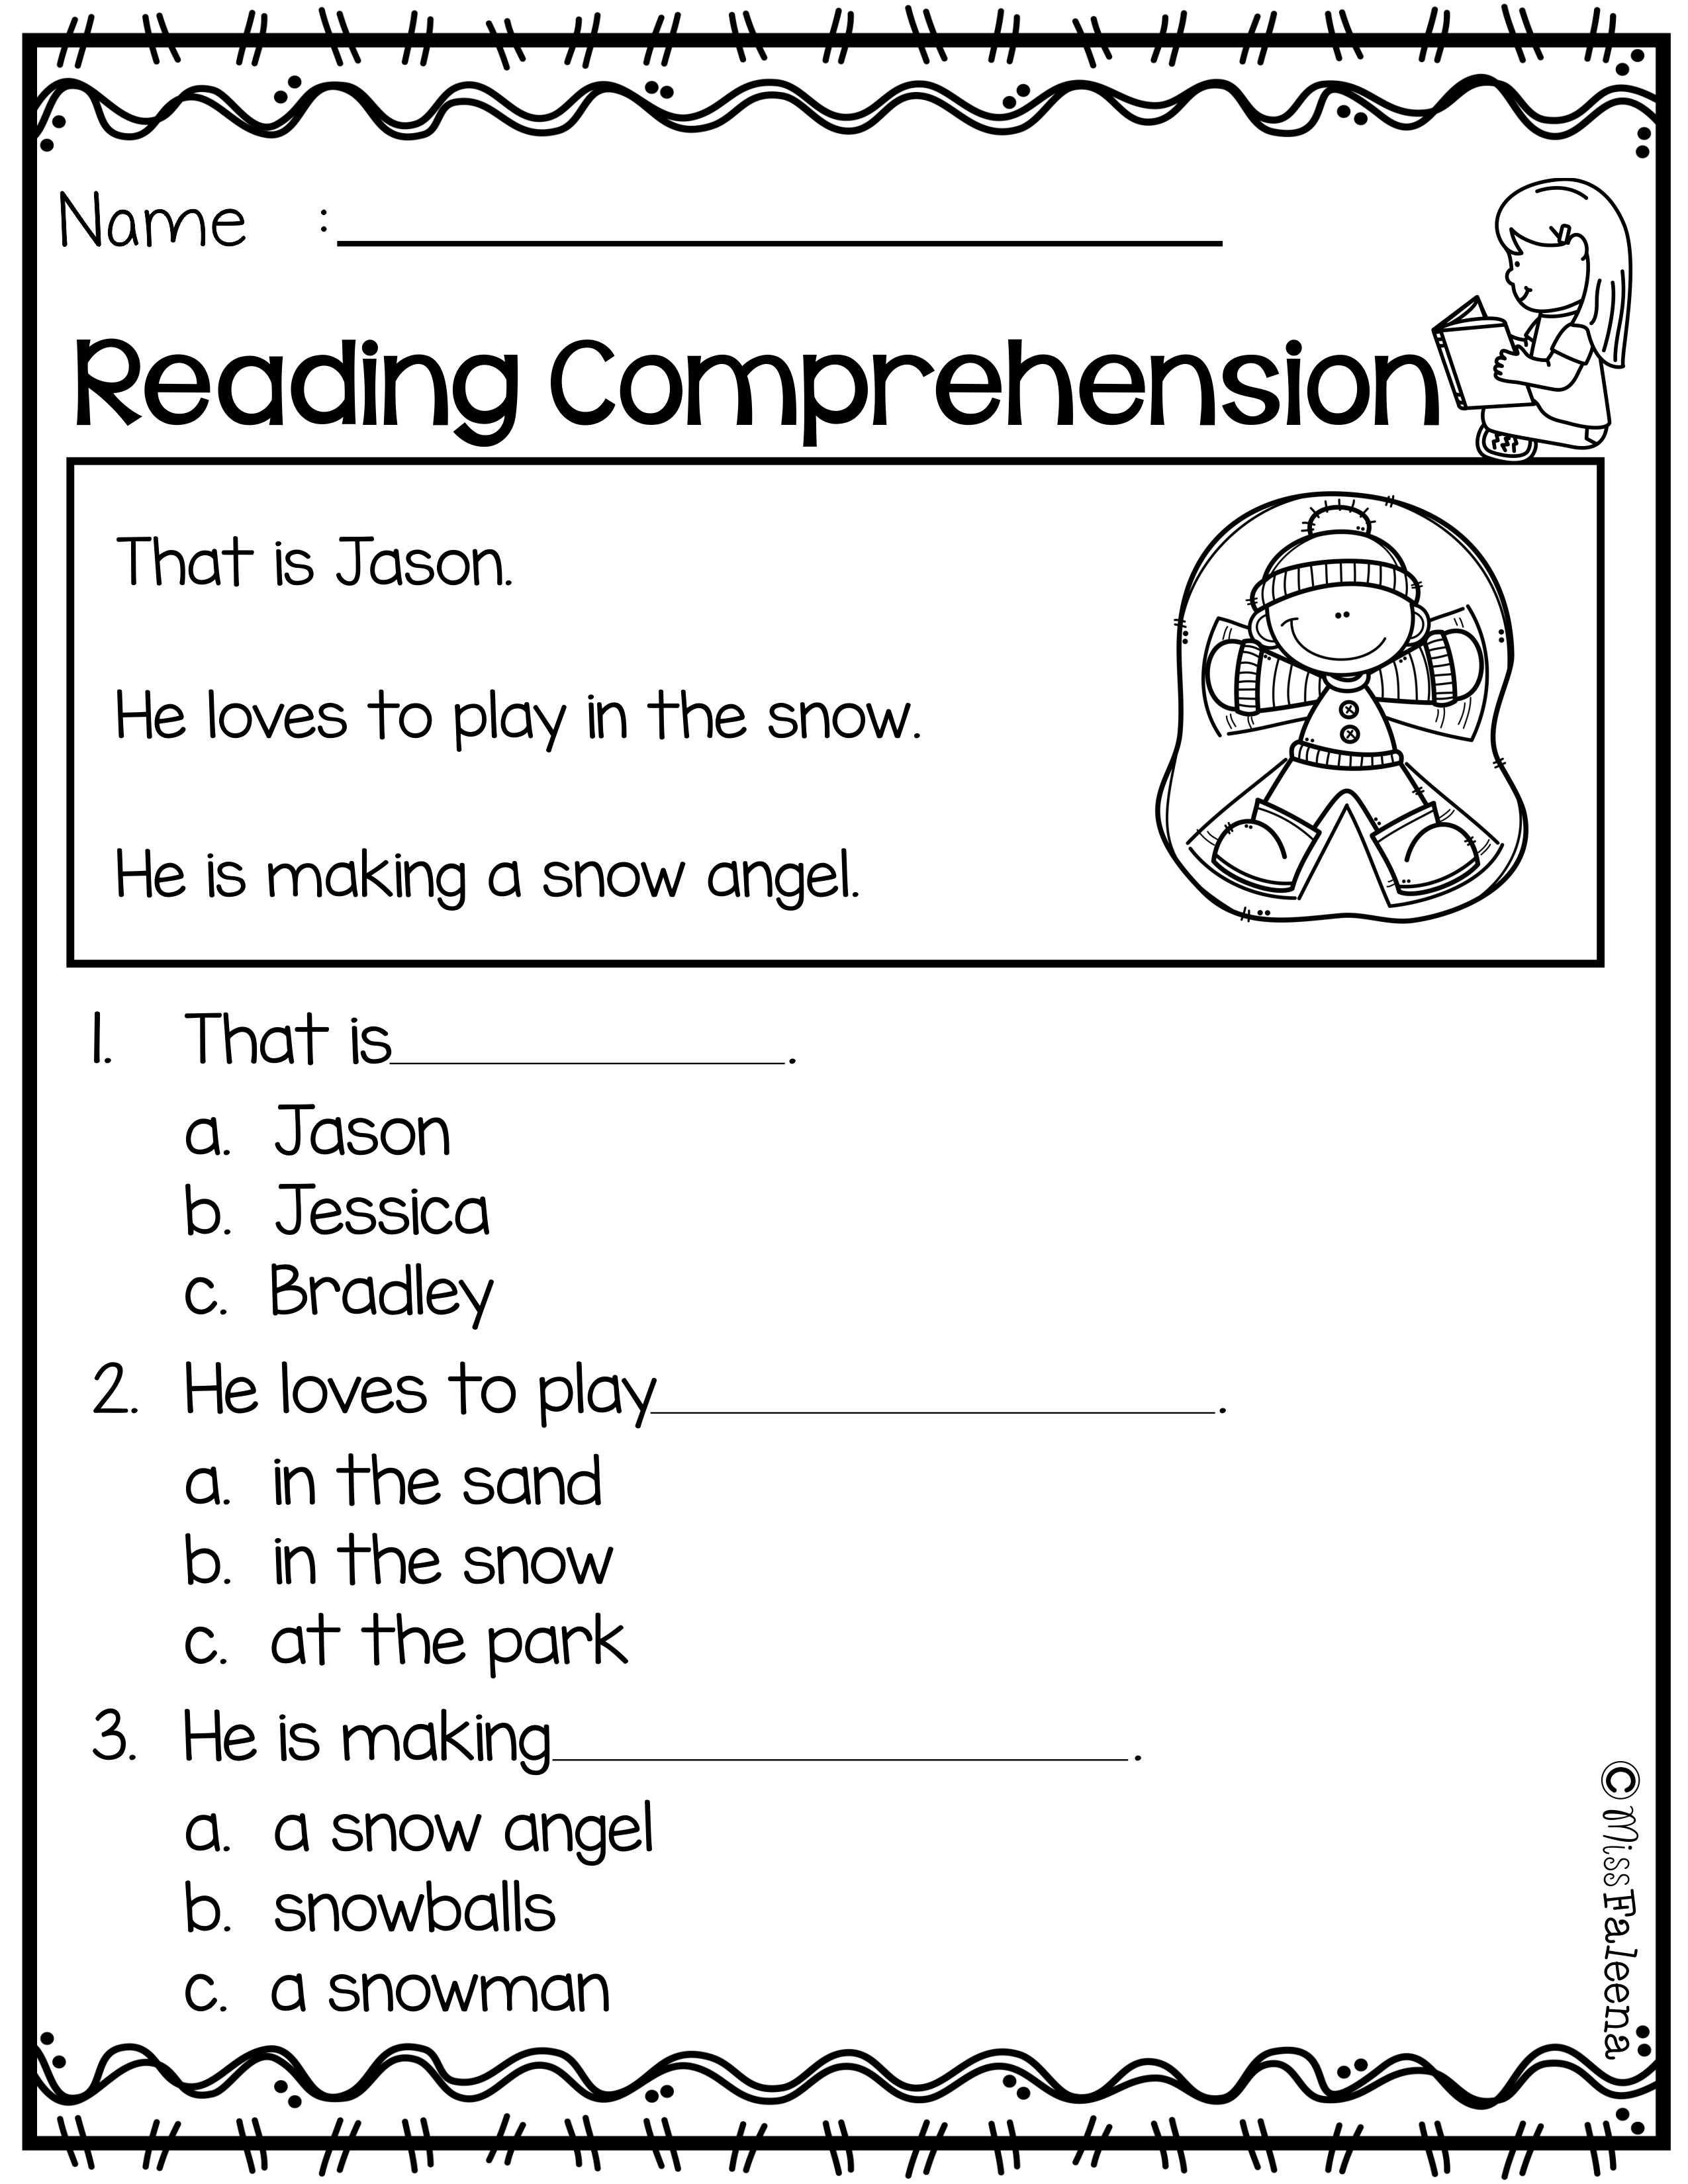 - Free Reading Comprehension Reading Comprehension Worksheets